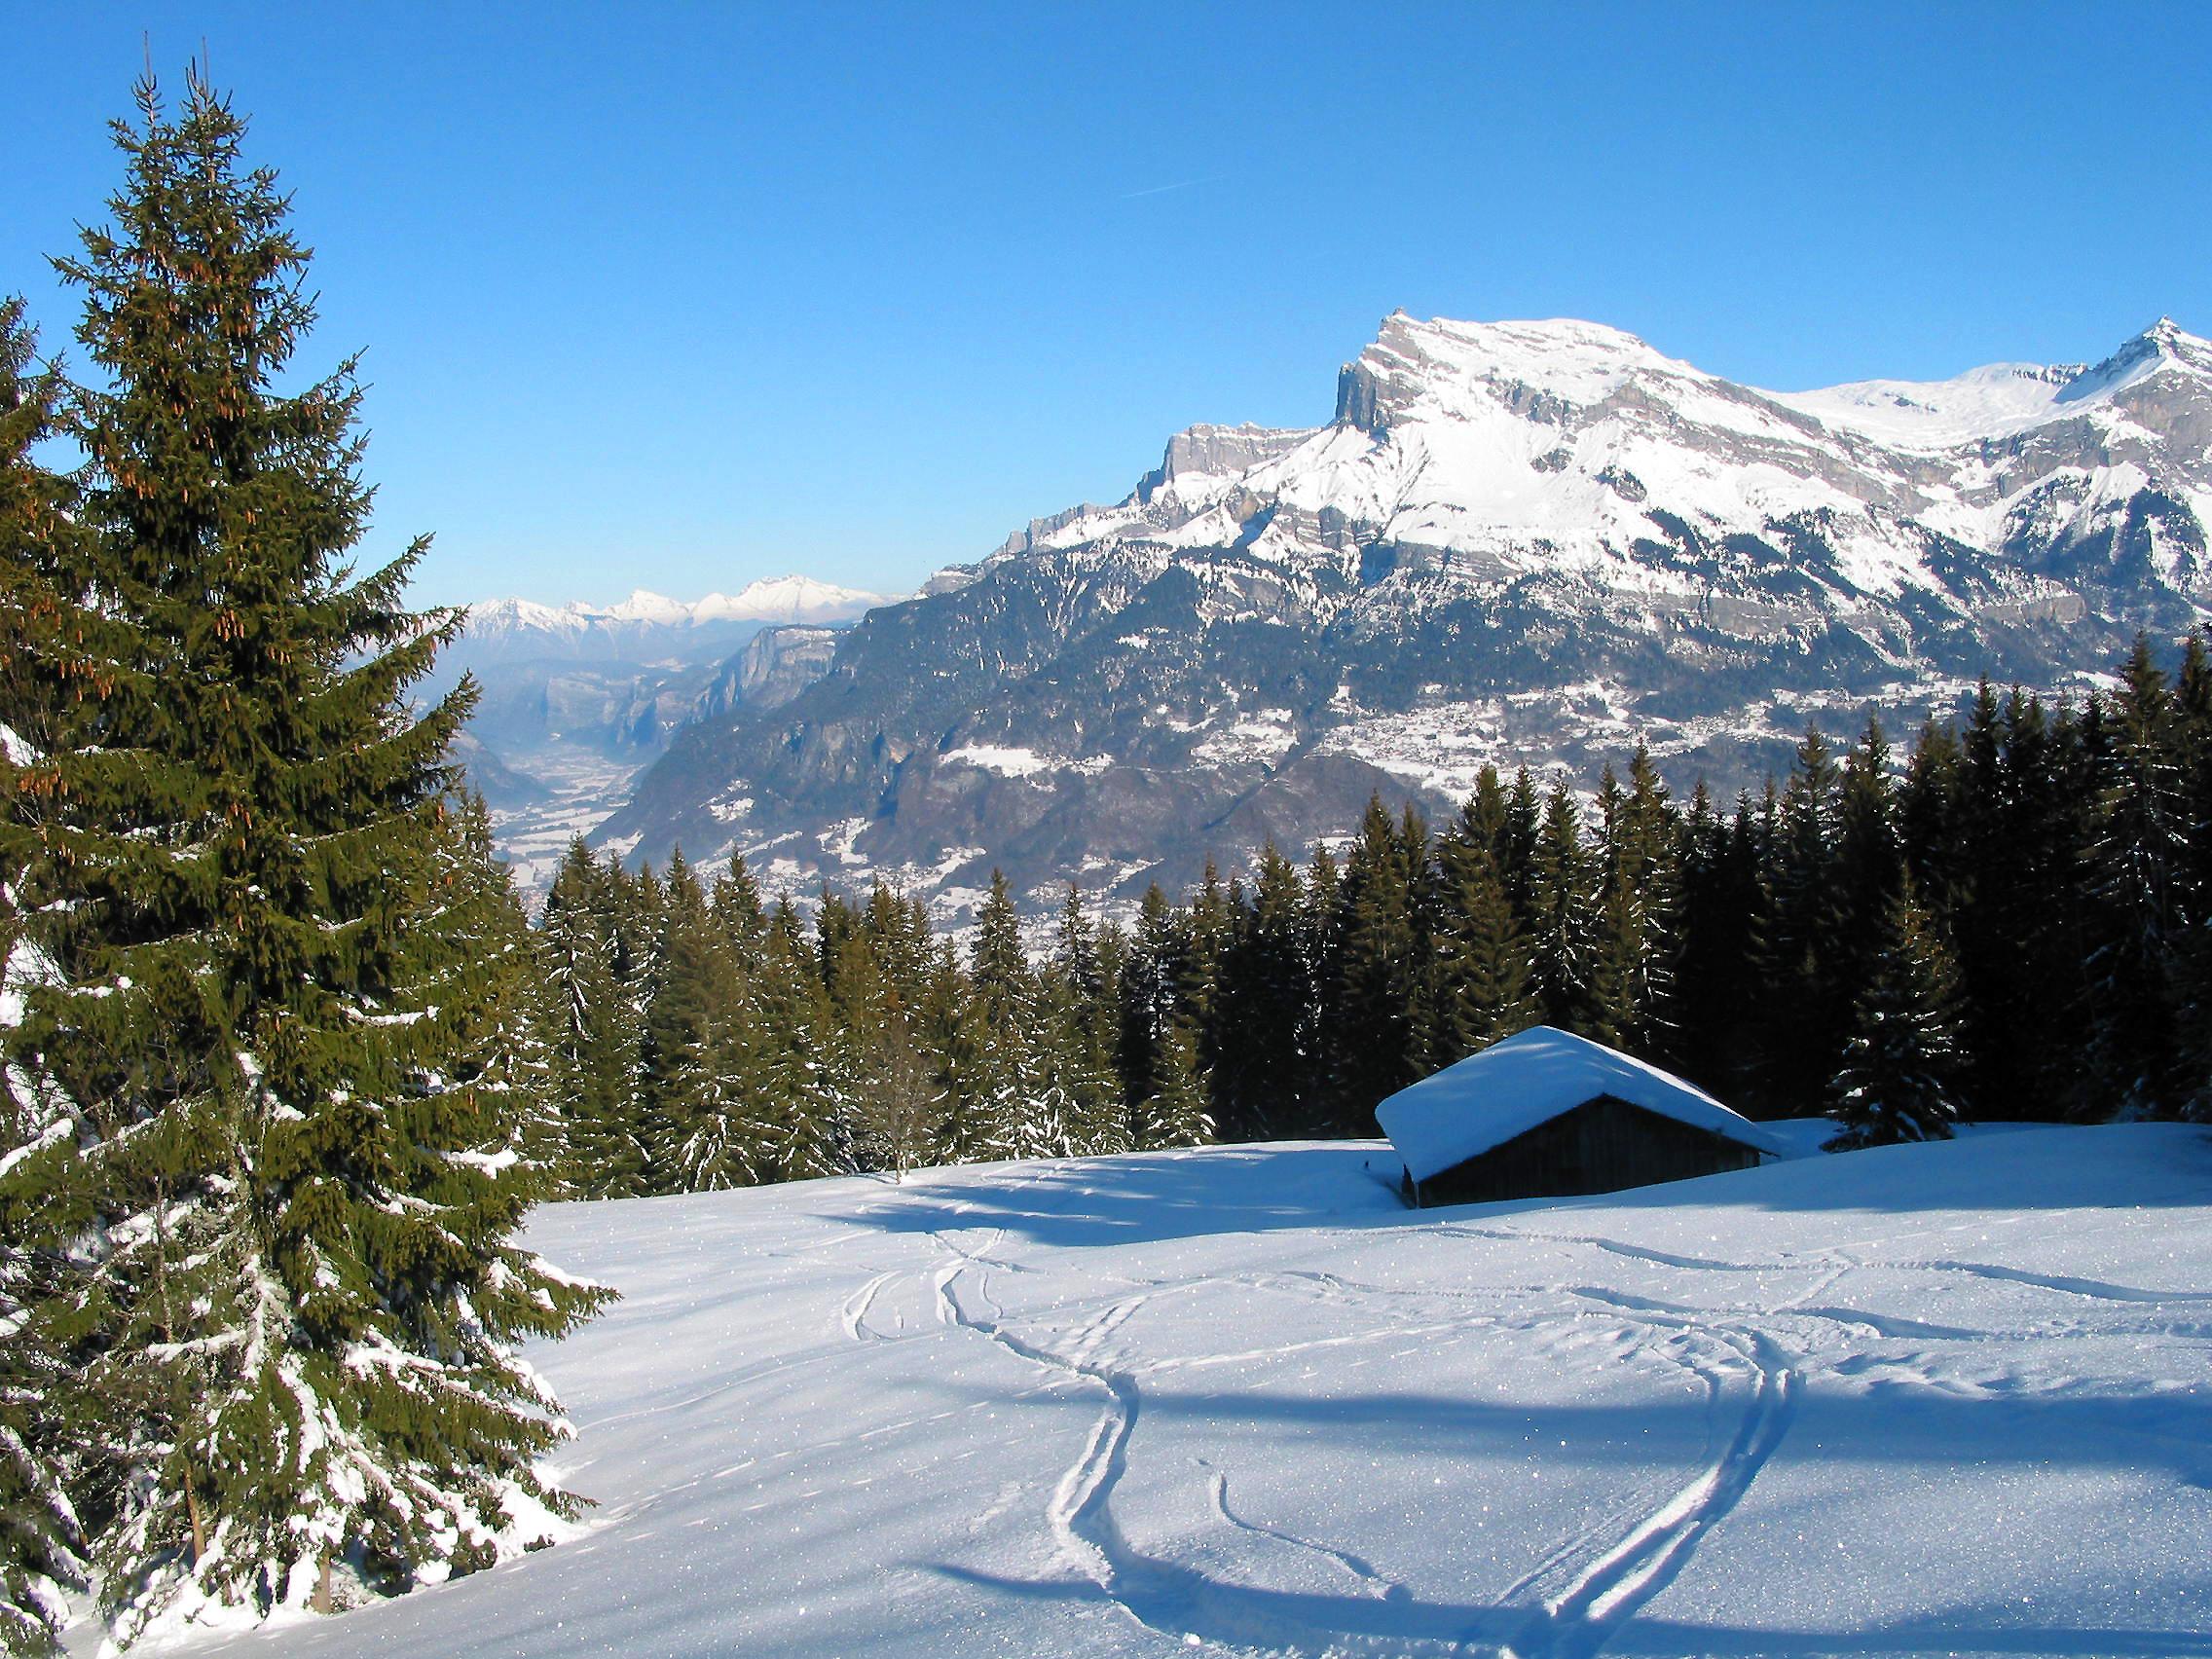 00 Saint Gervais les Bains Aiguille de Varan Wikimedia ...